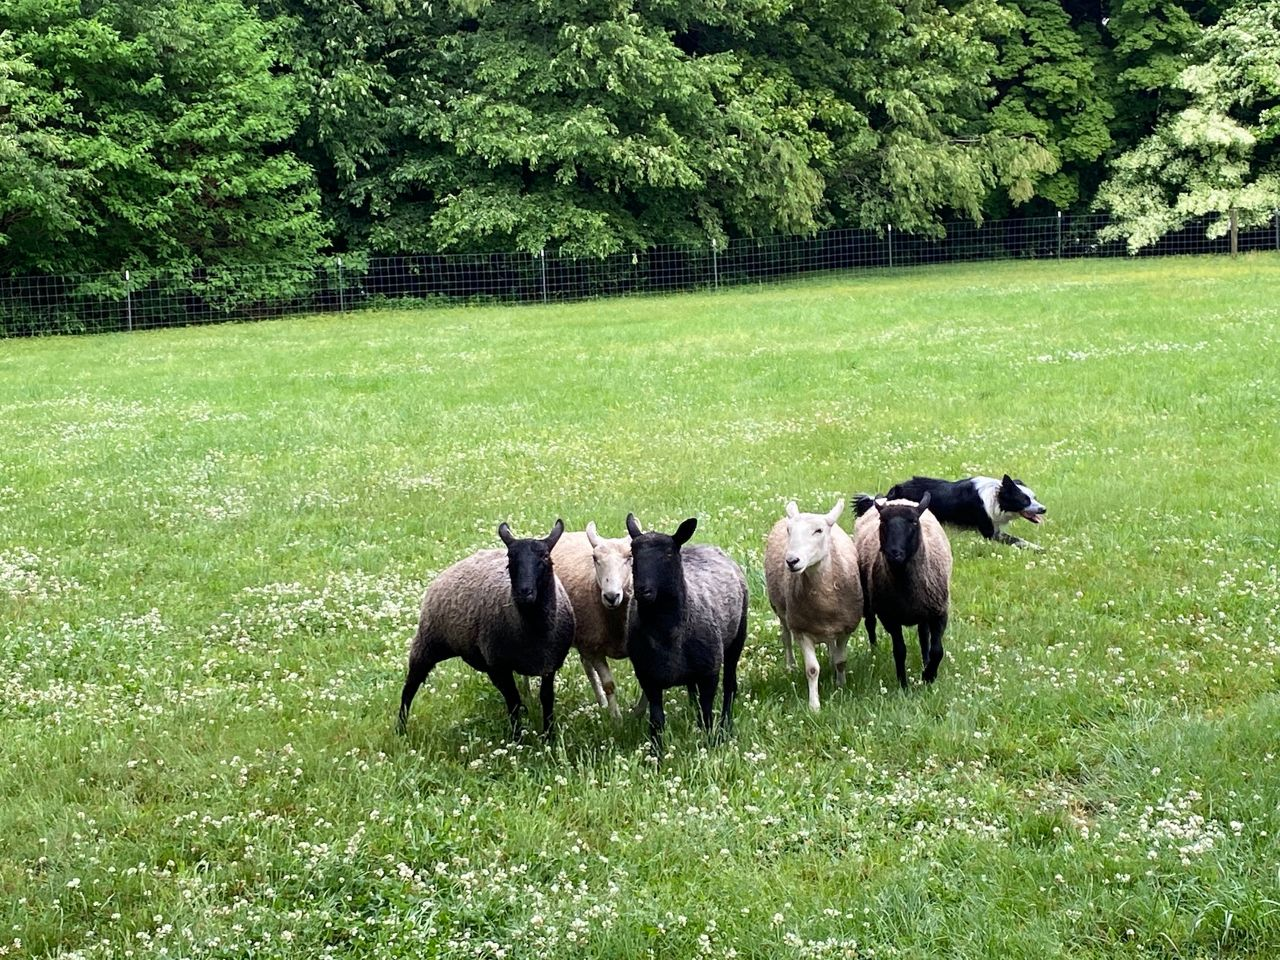 Owen herding sheep